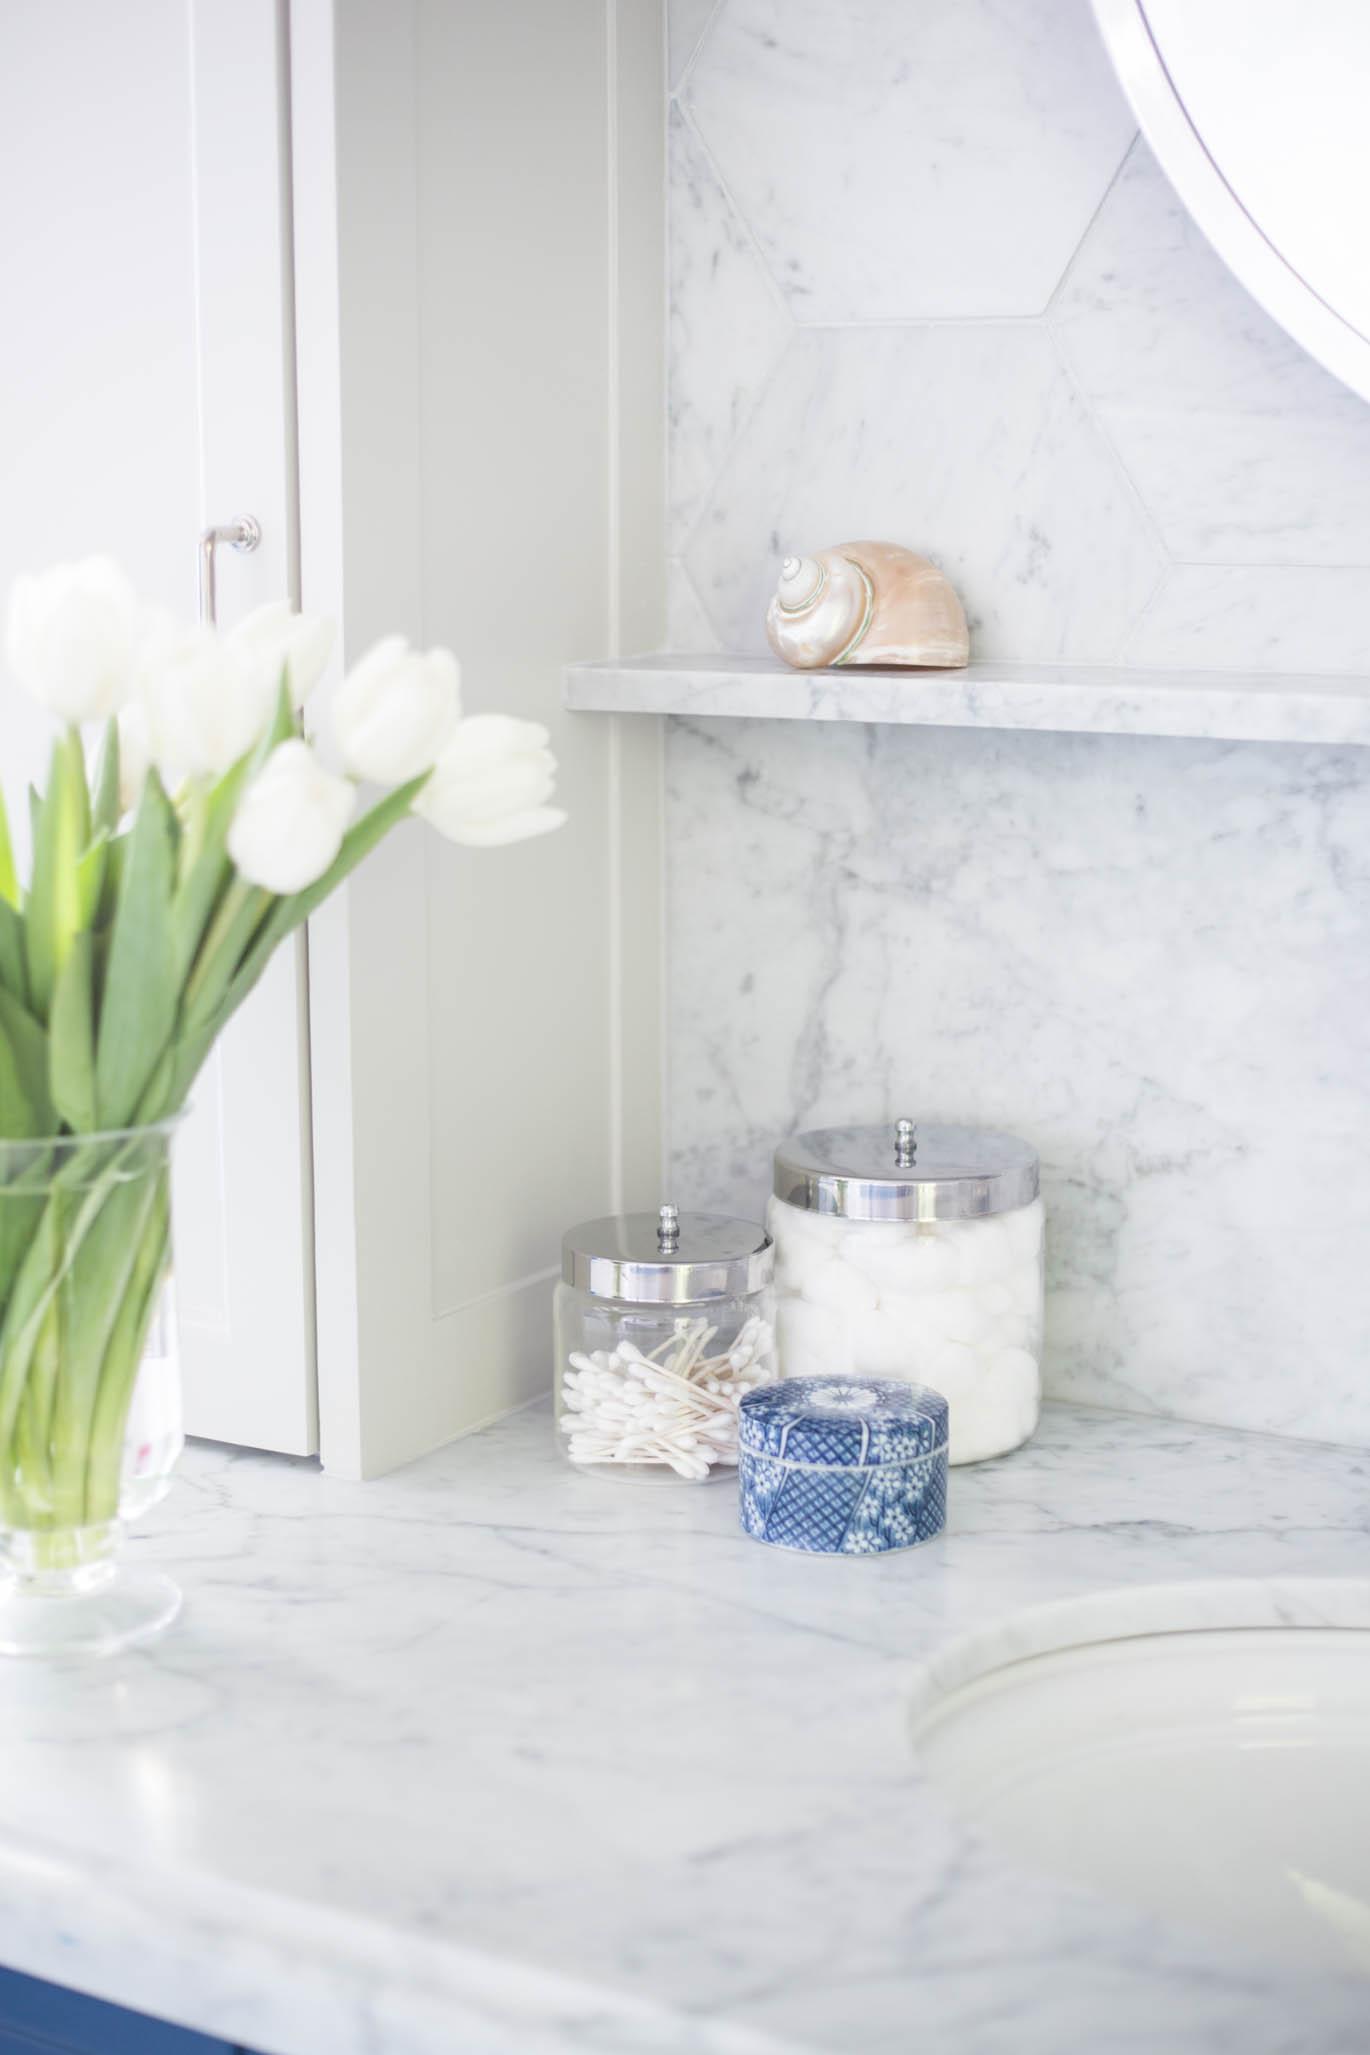 Marble ledge at bathroom sink   Carla Aston, Designer   Tori Aston, Photographer #bathroomremodel #marblebathroom #hextile